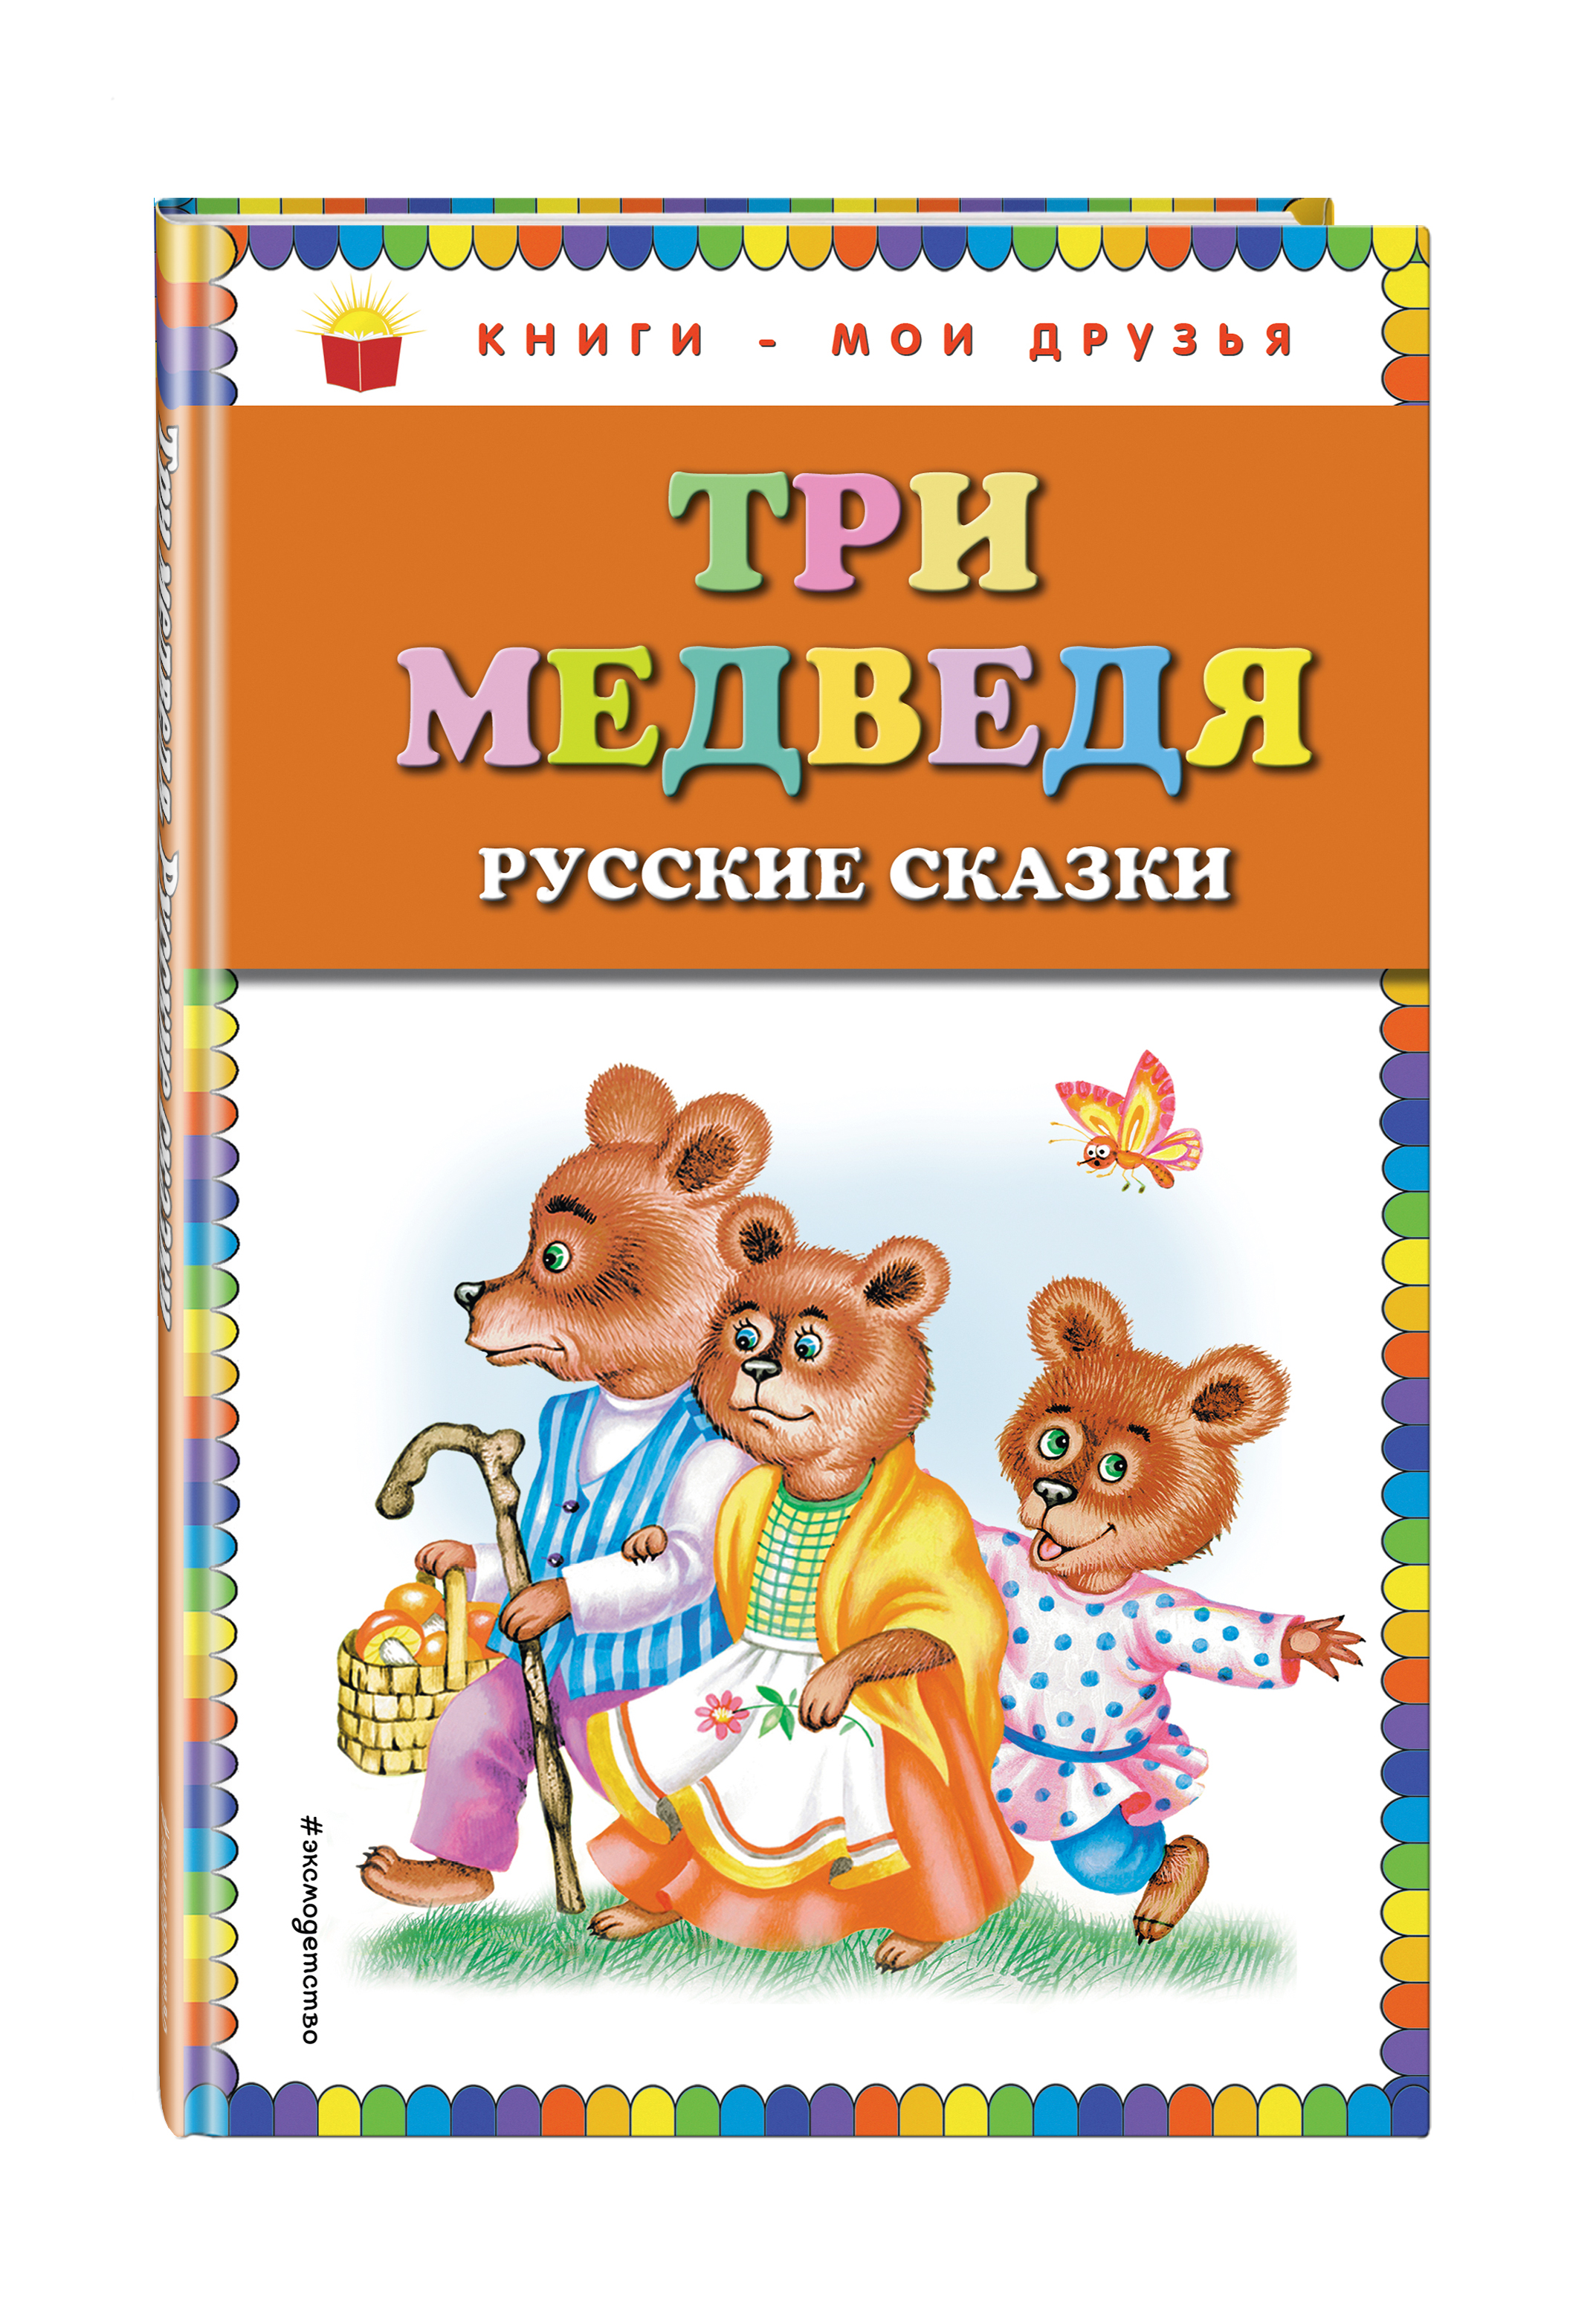 Три медведя. Русские сказки (ил. М. Литвиновой) цена